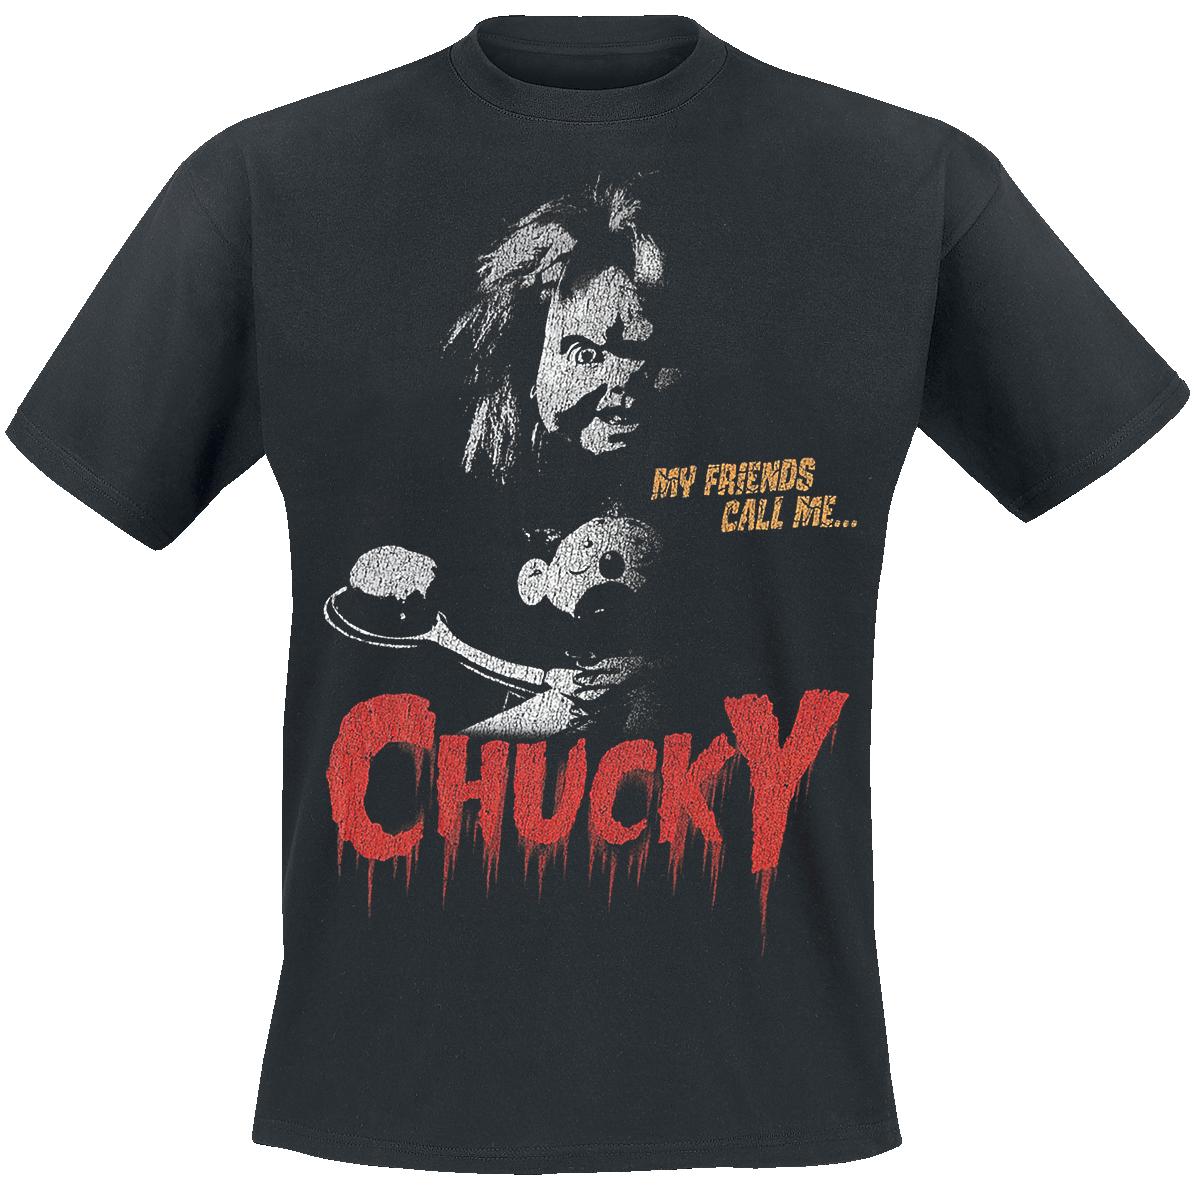 Chucky - My Friends Call Me Chucky - T-Shirt - black image